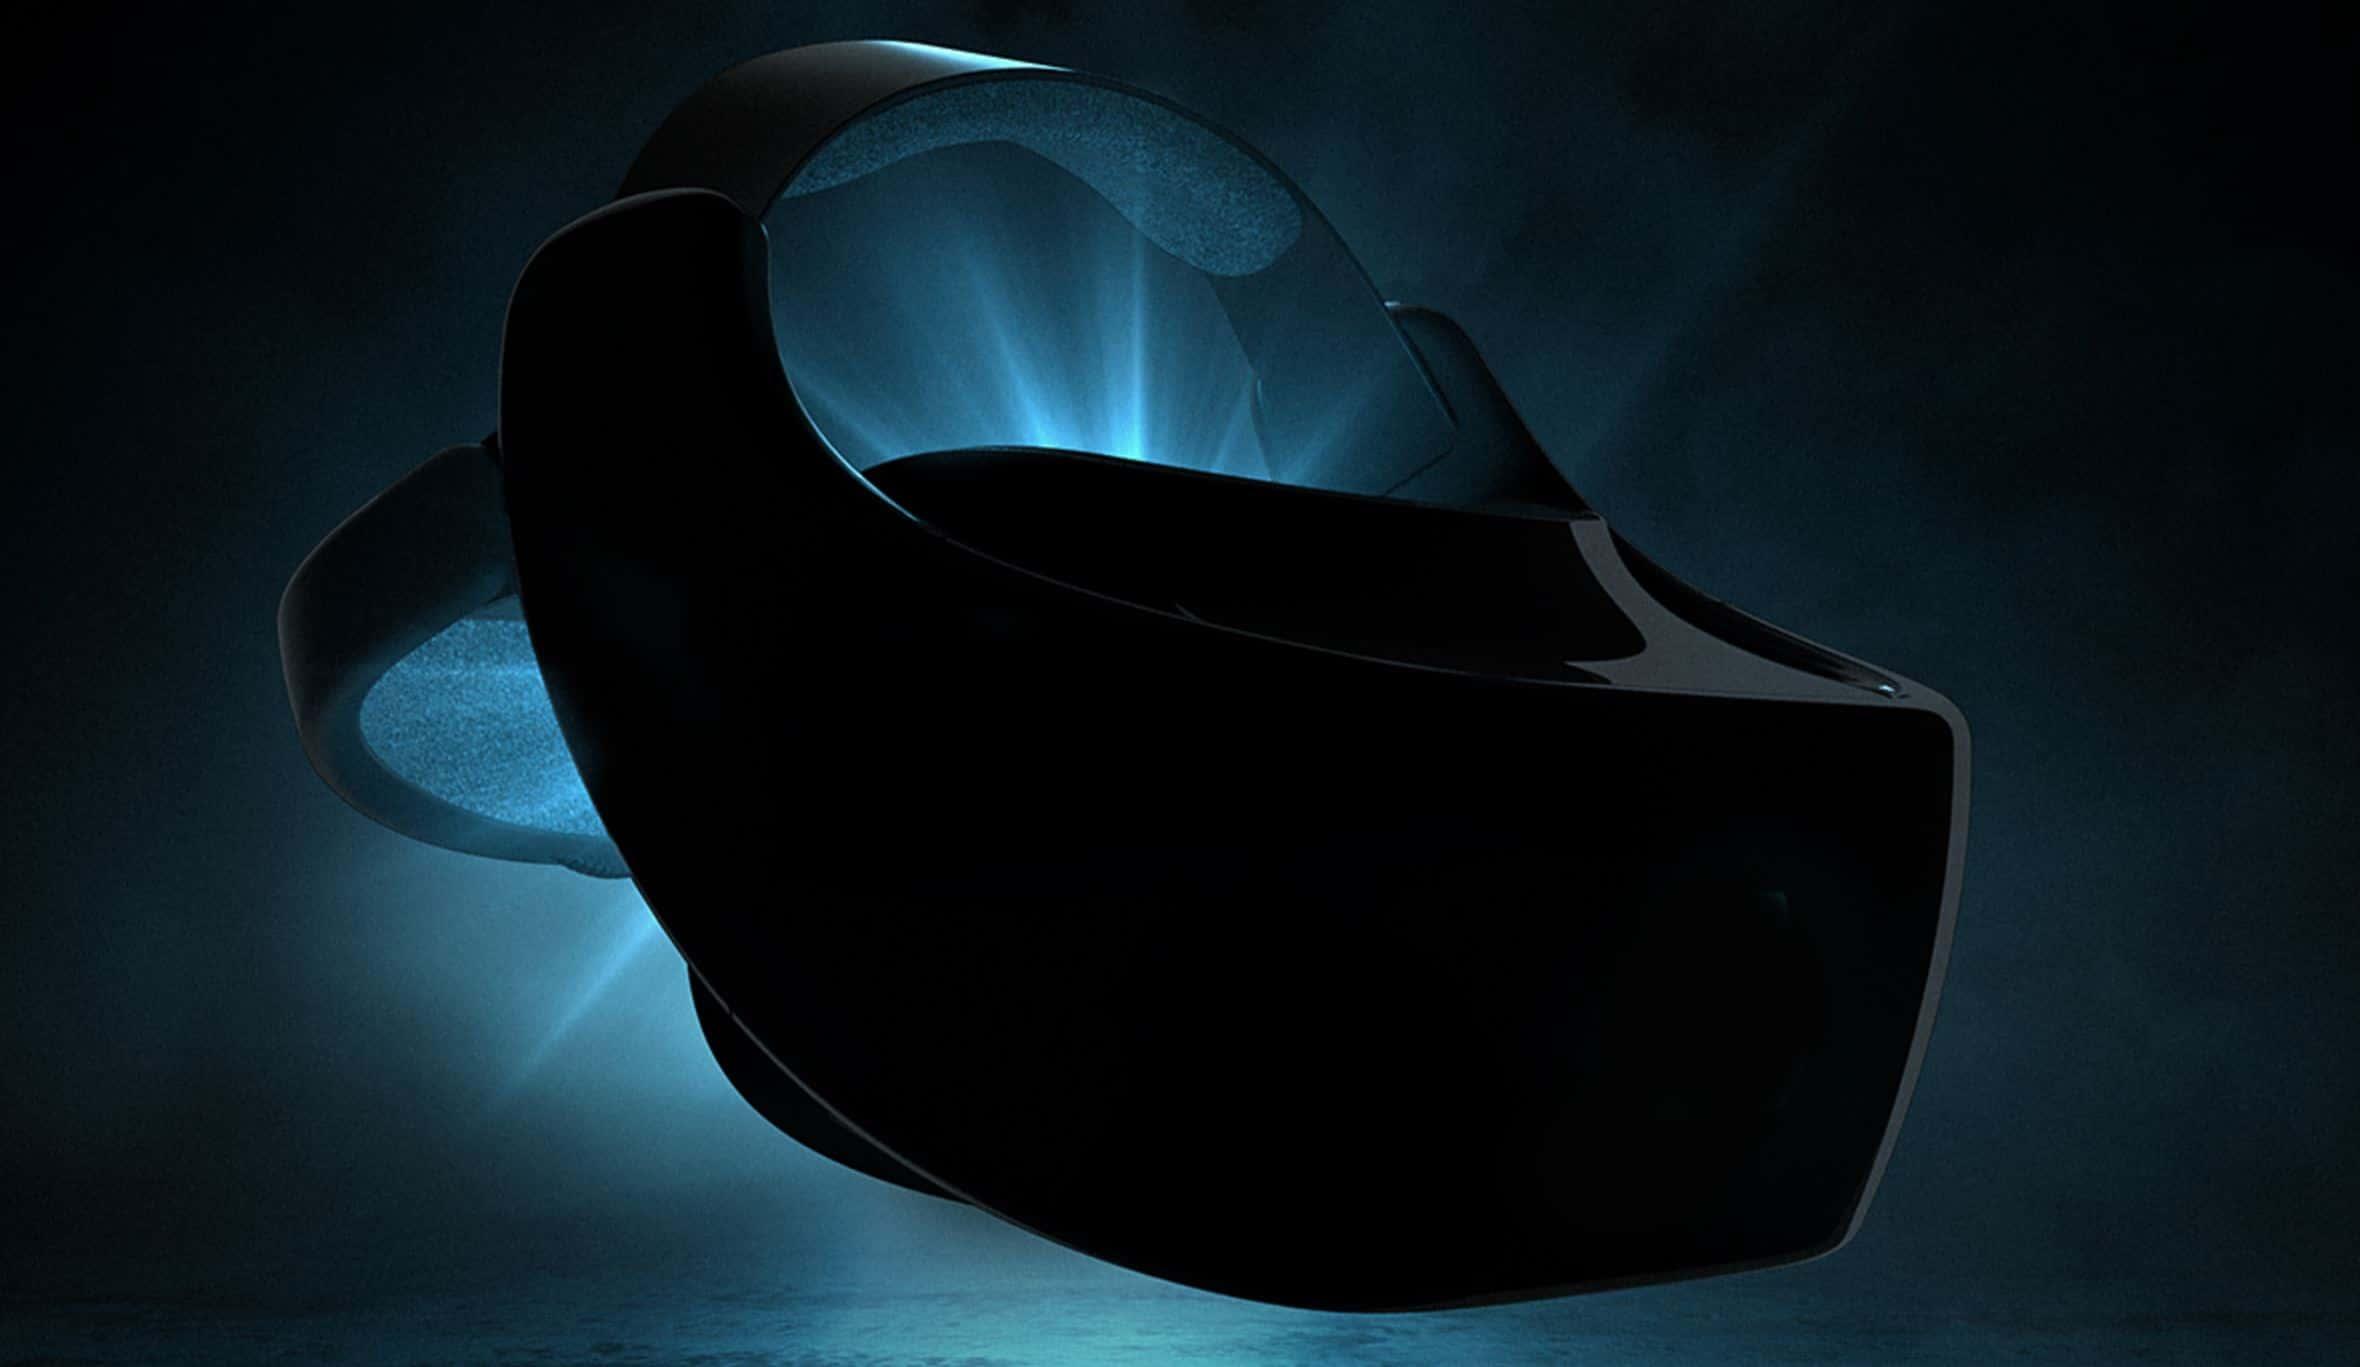 HTC Vive Google Daydream VR Headset Promo